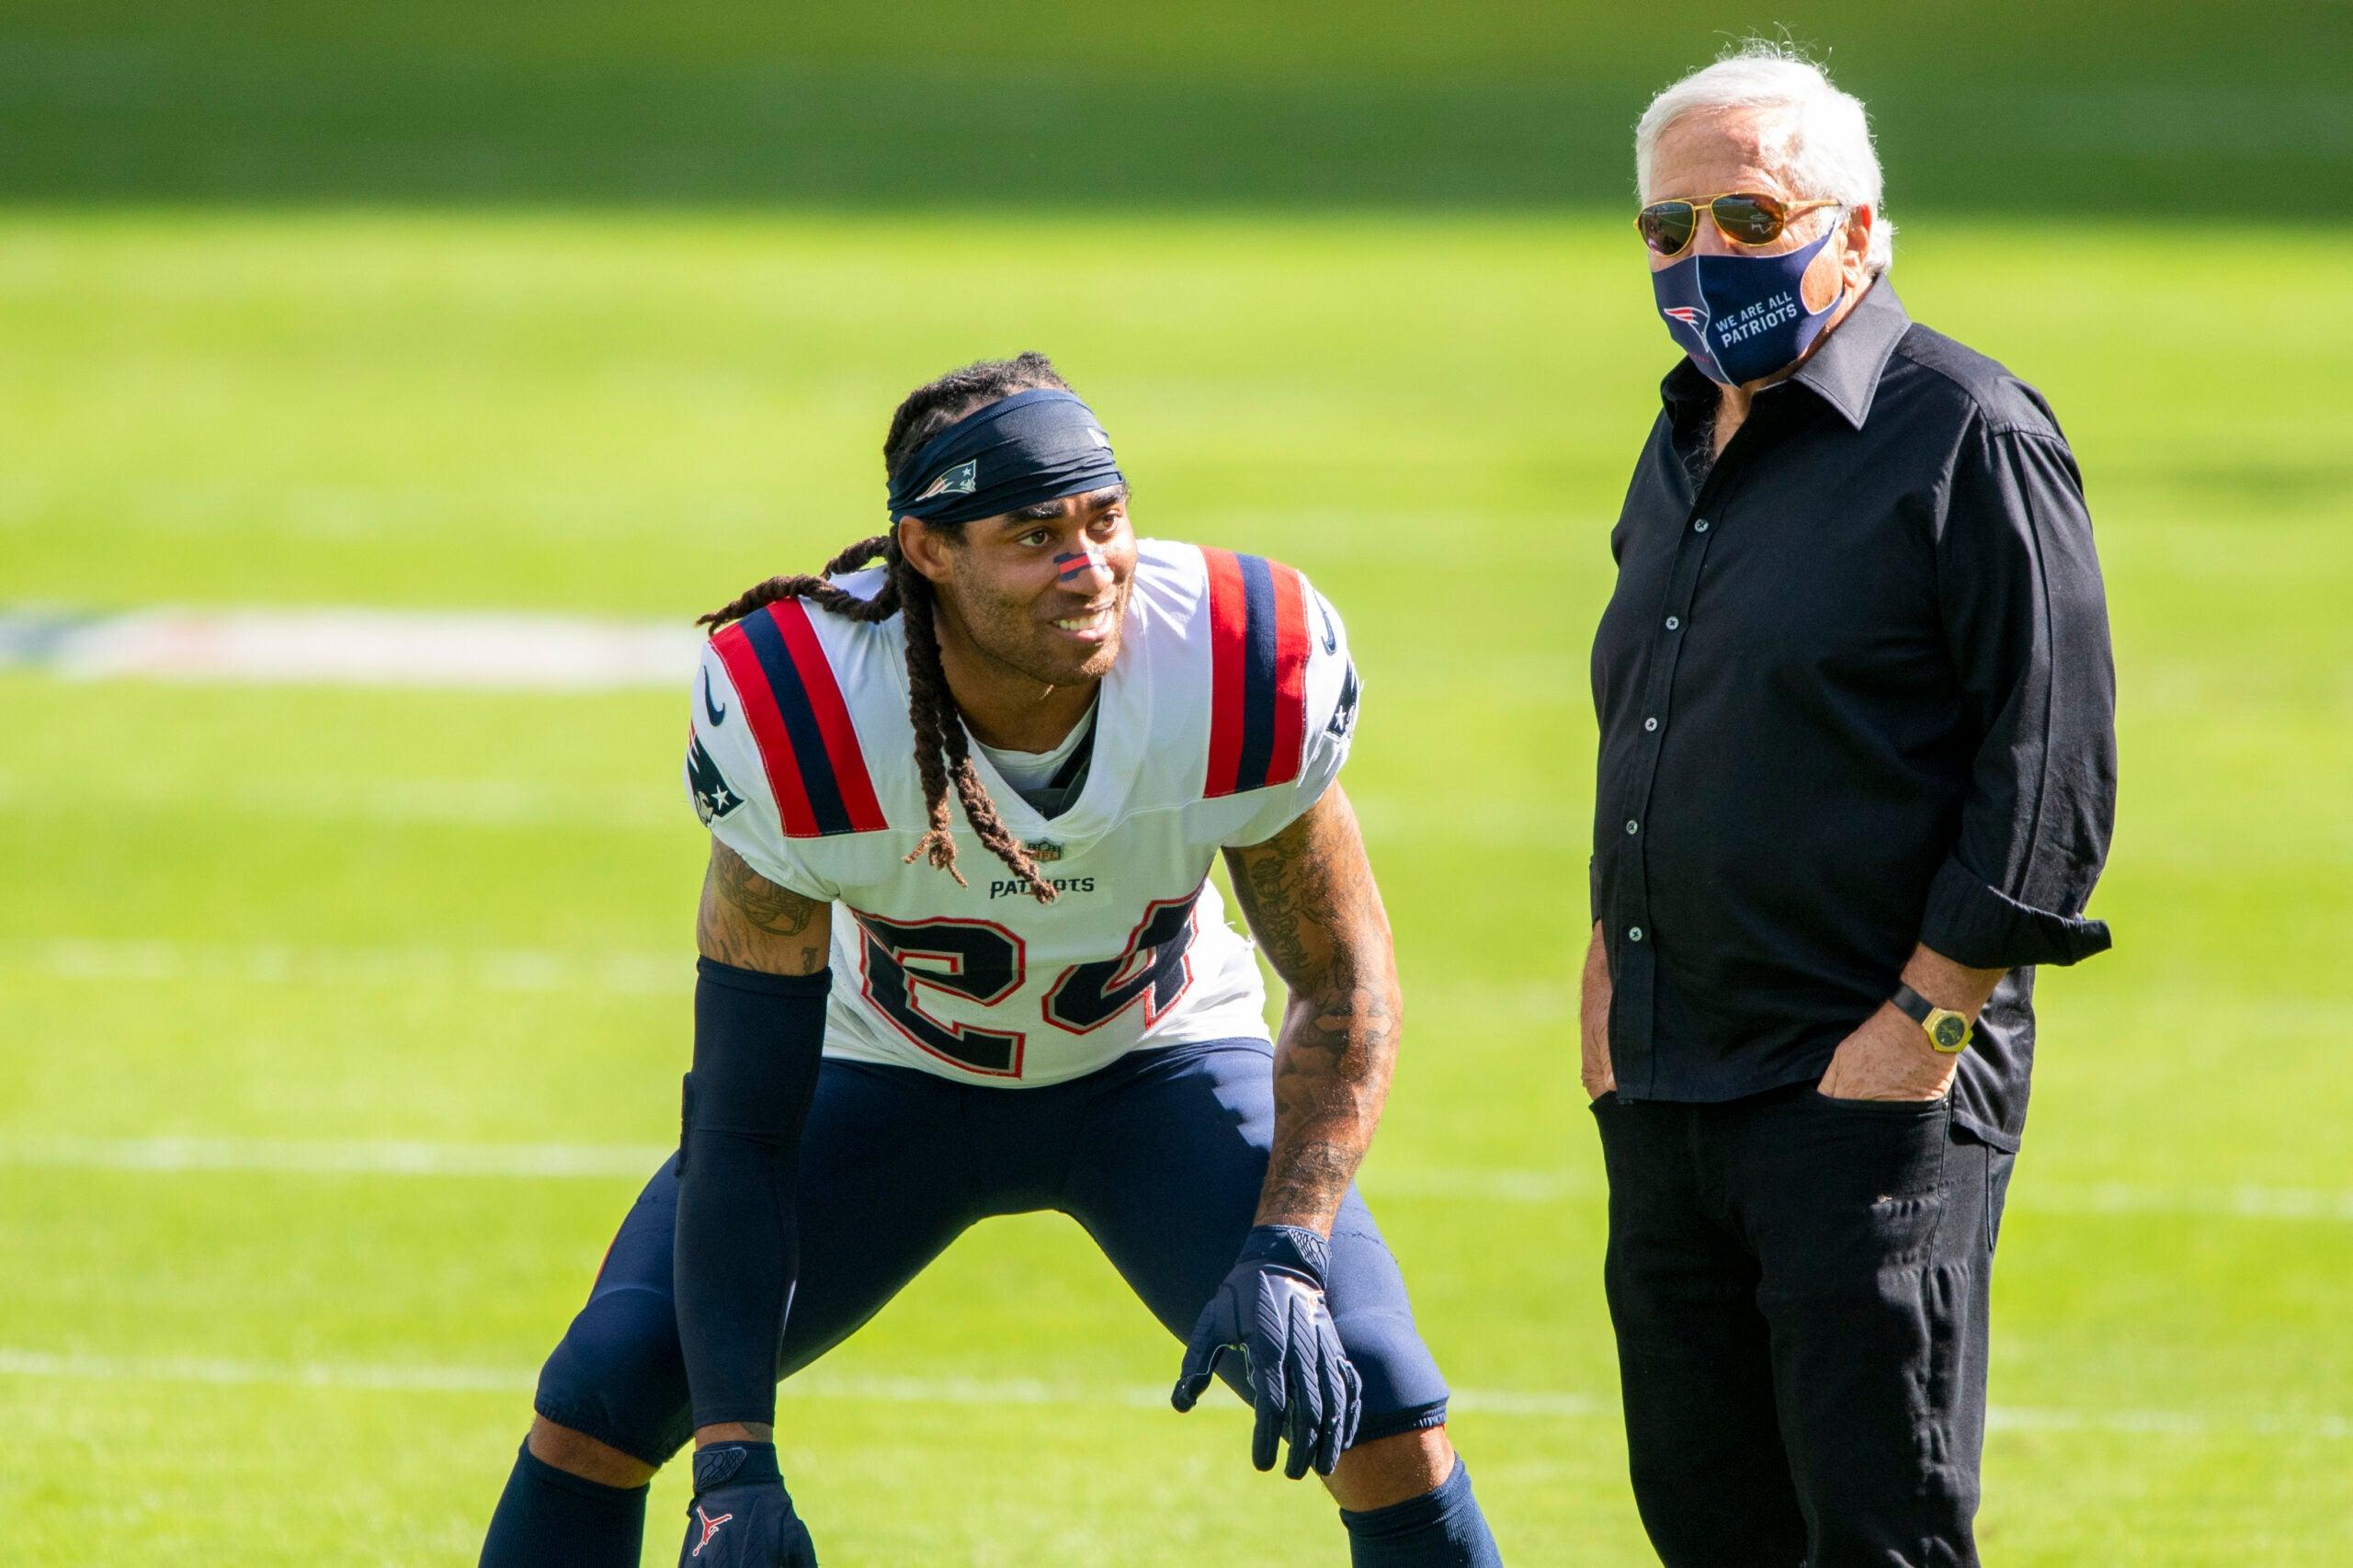 Ian Rapoport hints Patriots' PUP move could resolve Stephon Gilmore saga - Boston.com